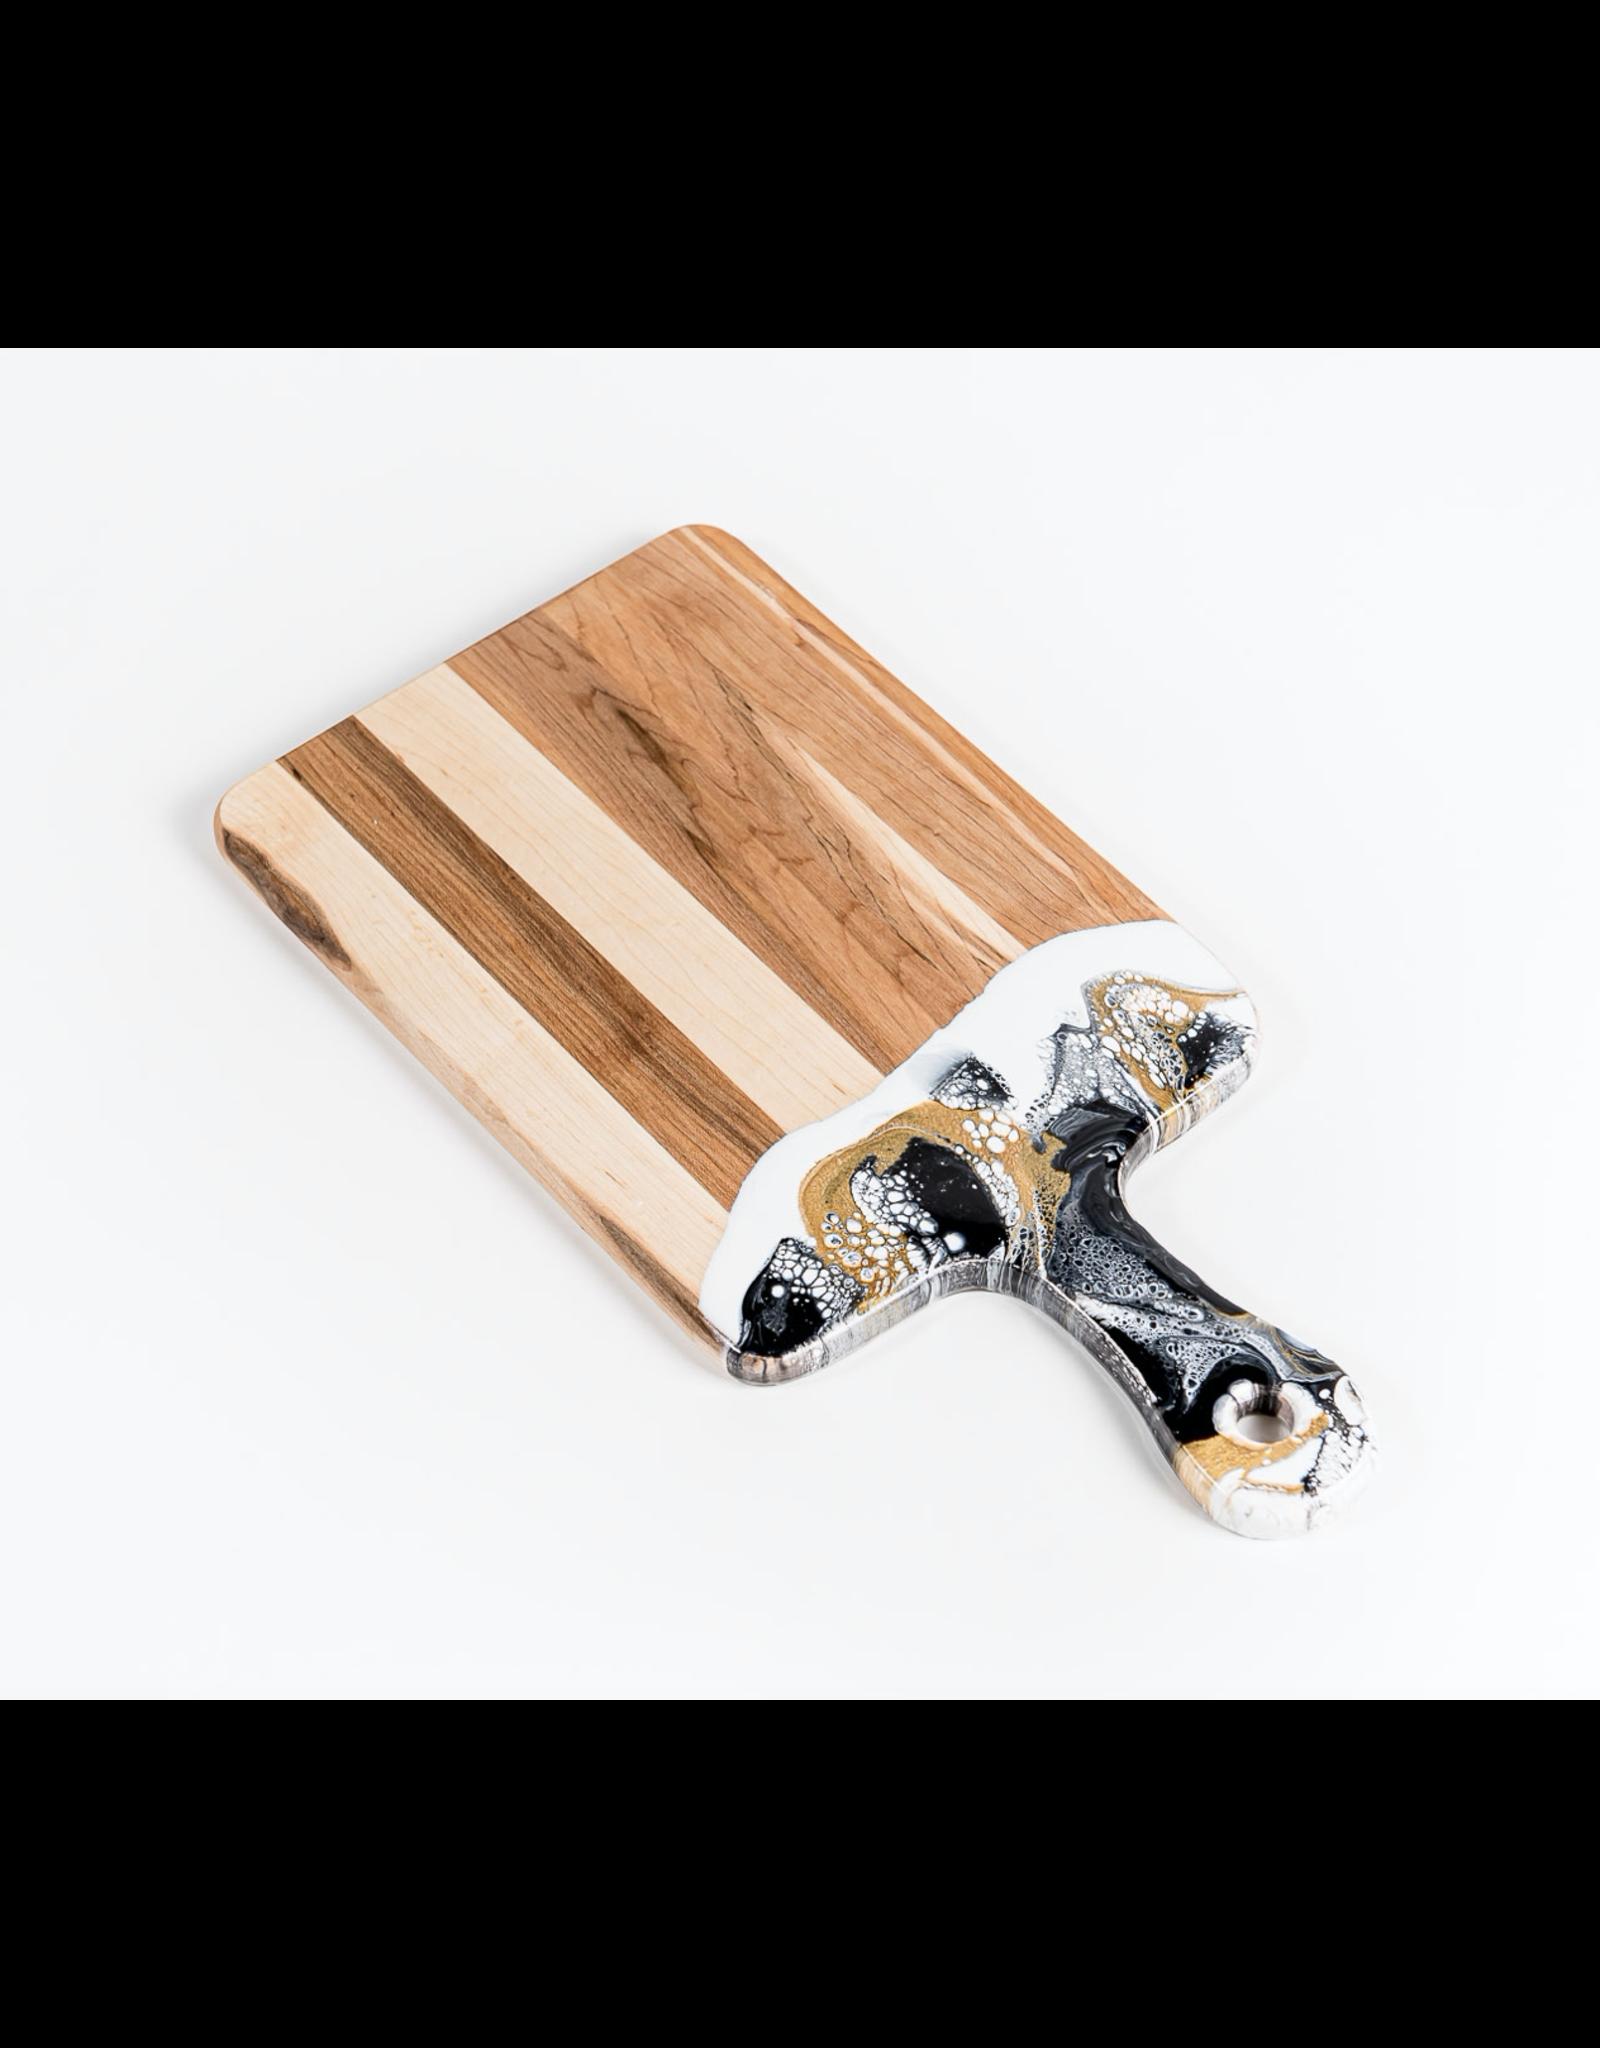 "Lynn & Liana Canadian Maple Resin Cheeseboard Medium 8"" x 16"""